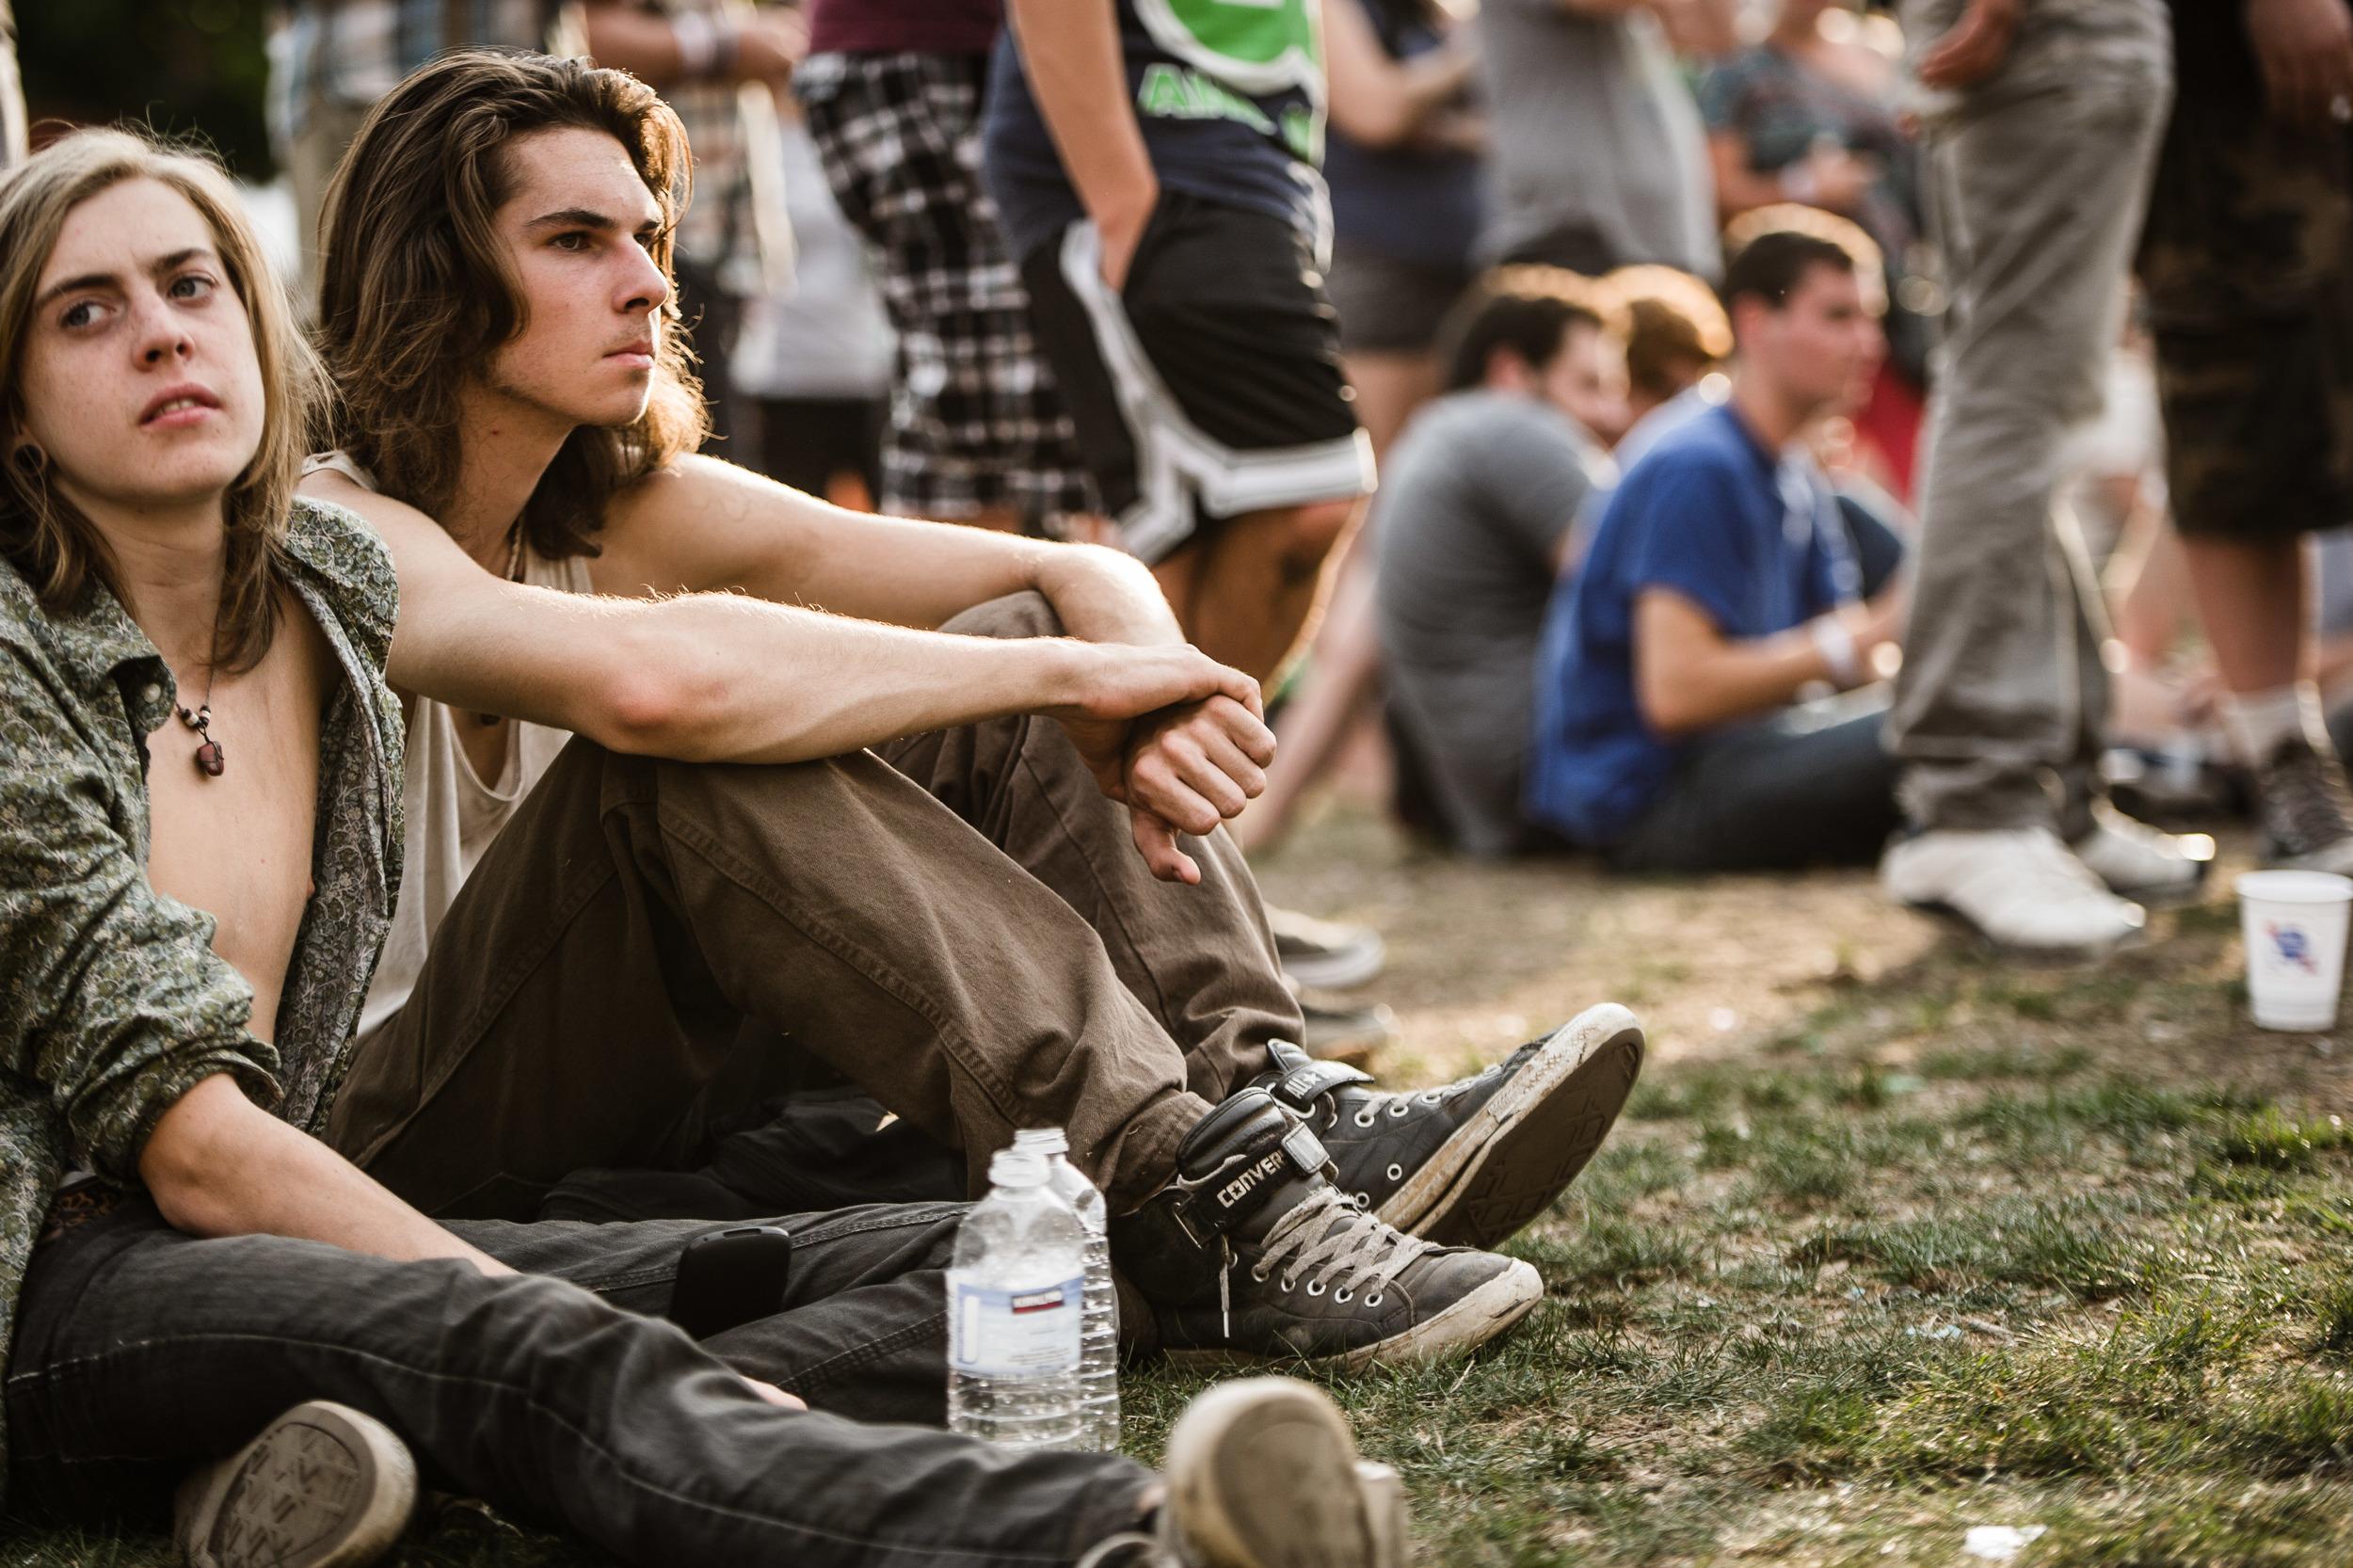 Concert Riot Fest August 2013-582.jpg